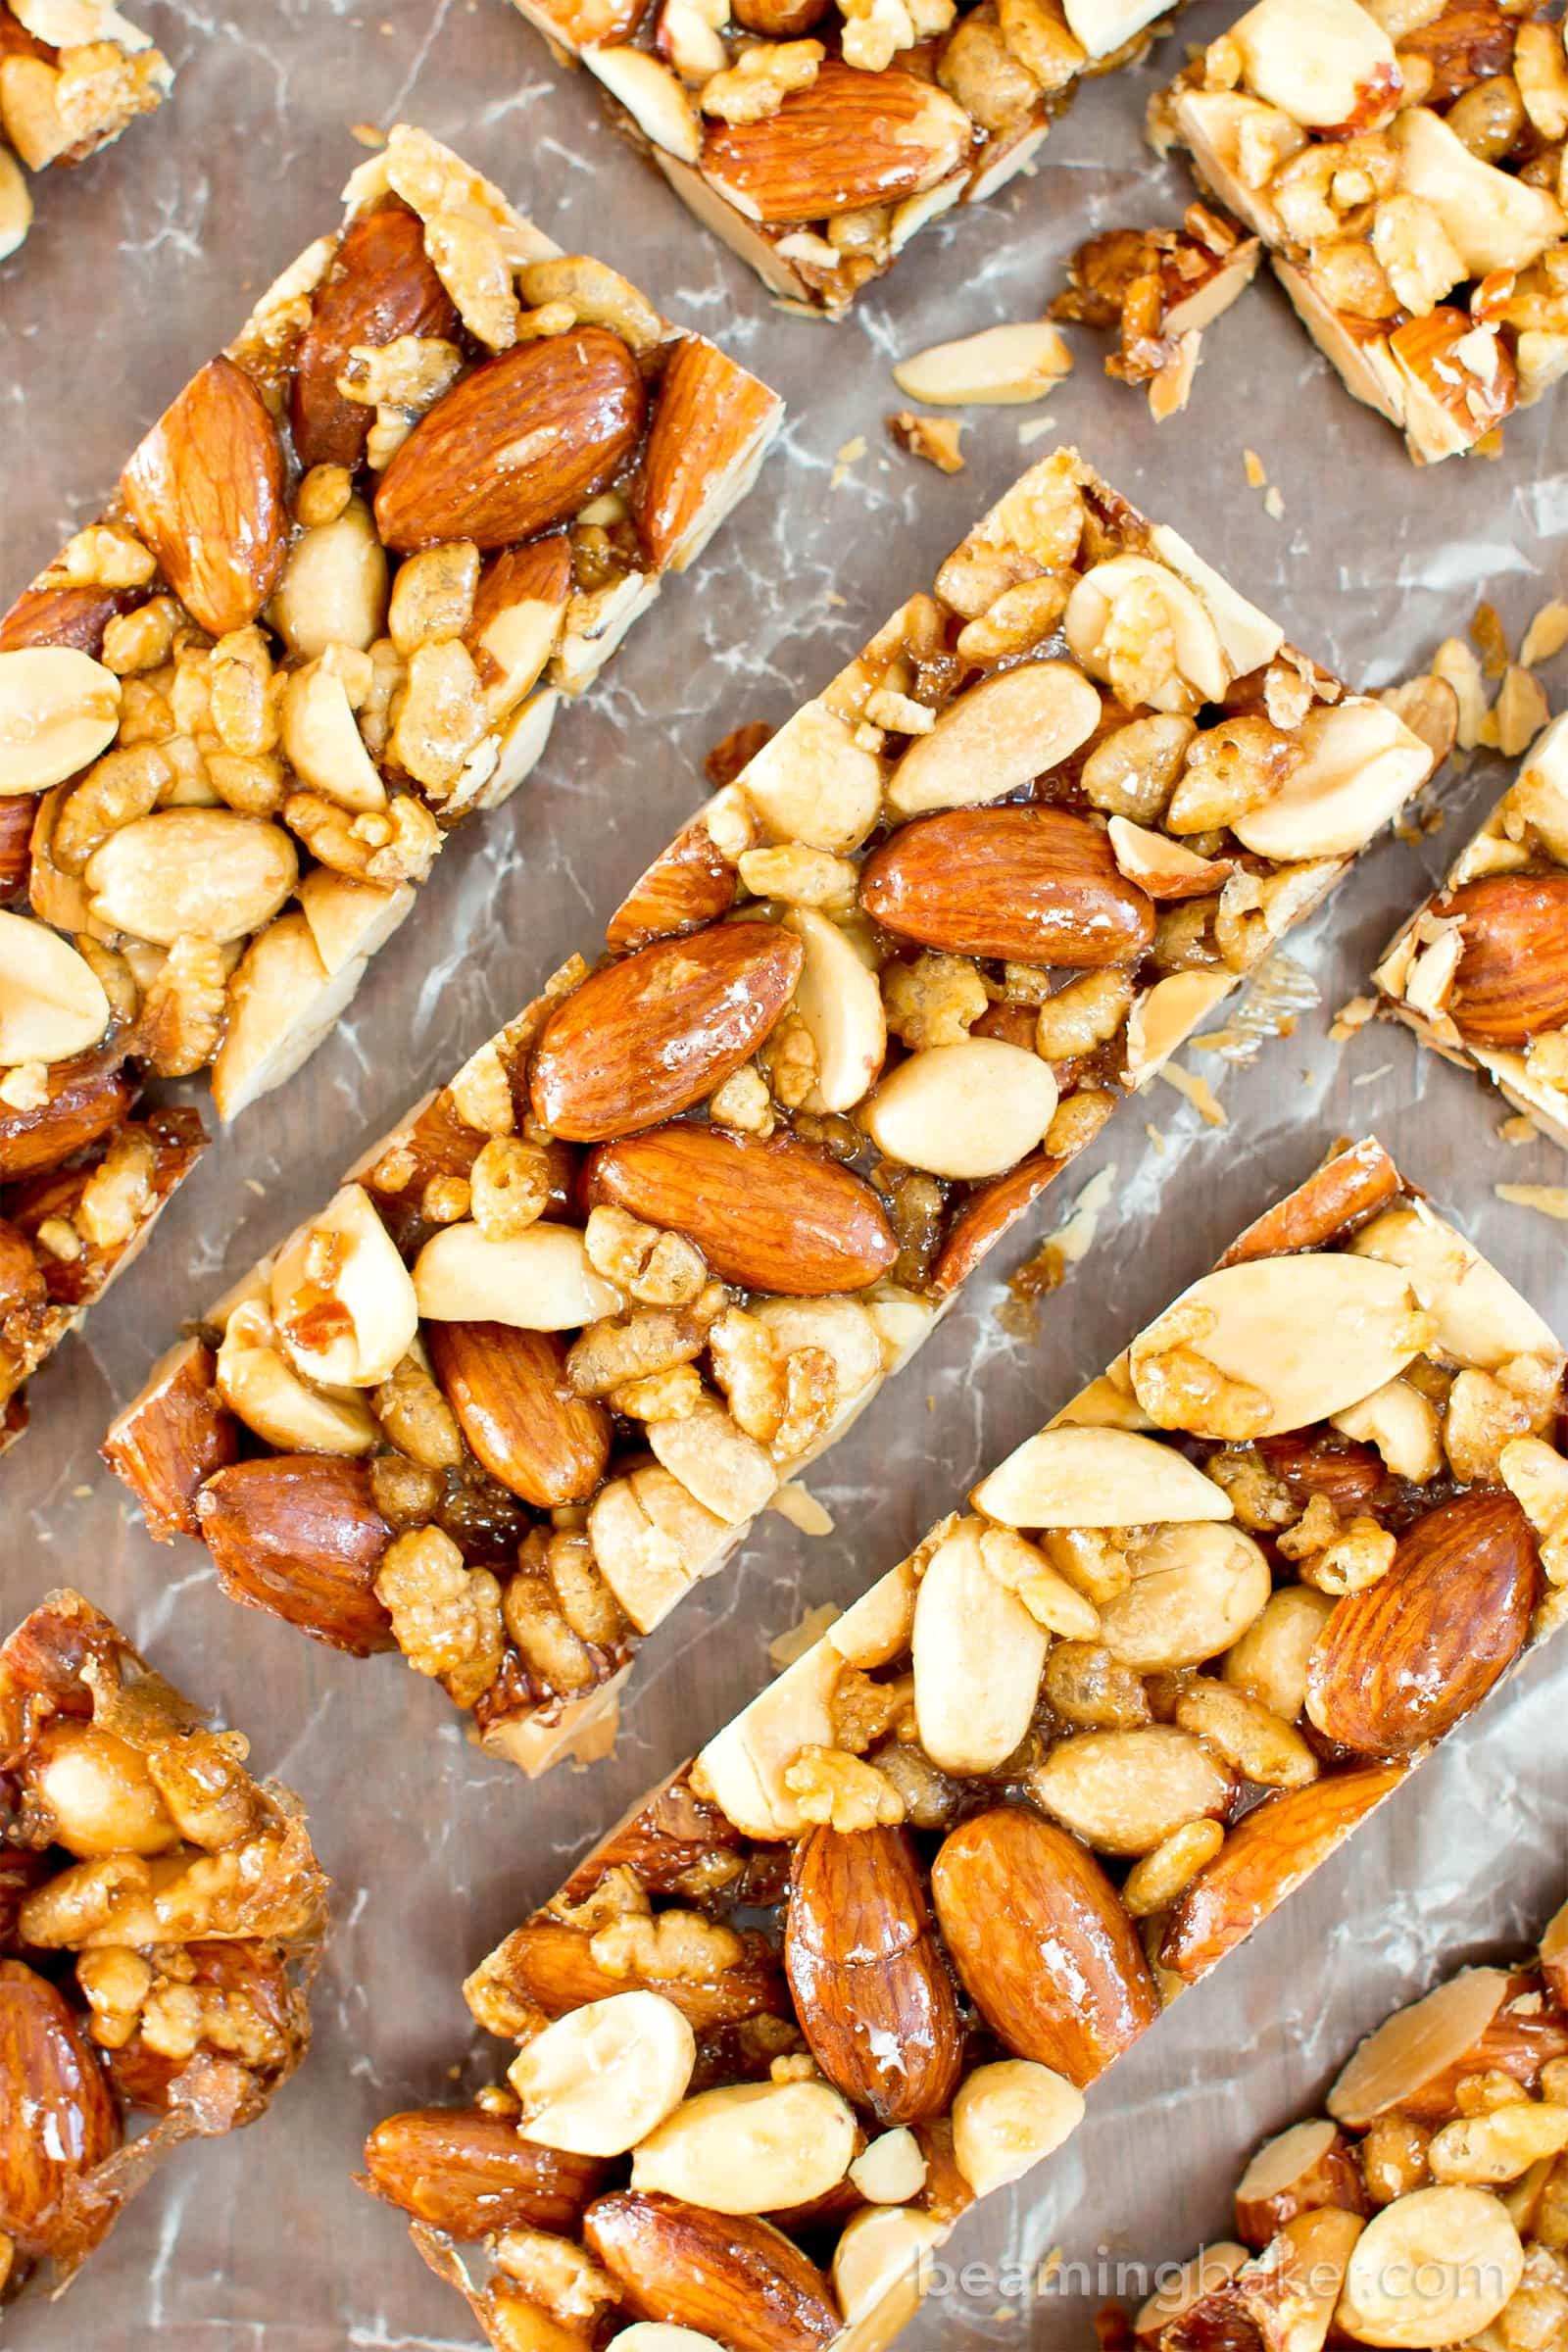 Healthy Snacks Recipes  15 Easy Healthy Gluten Free Vegan Snack Recipes Beaming